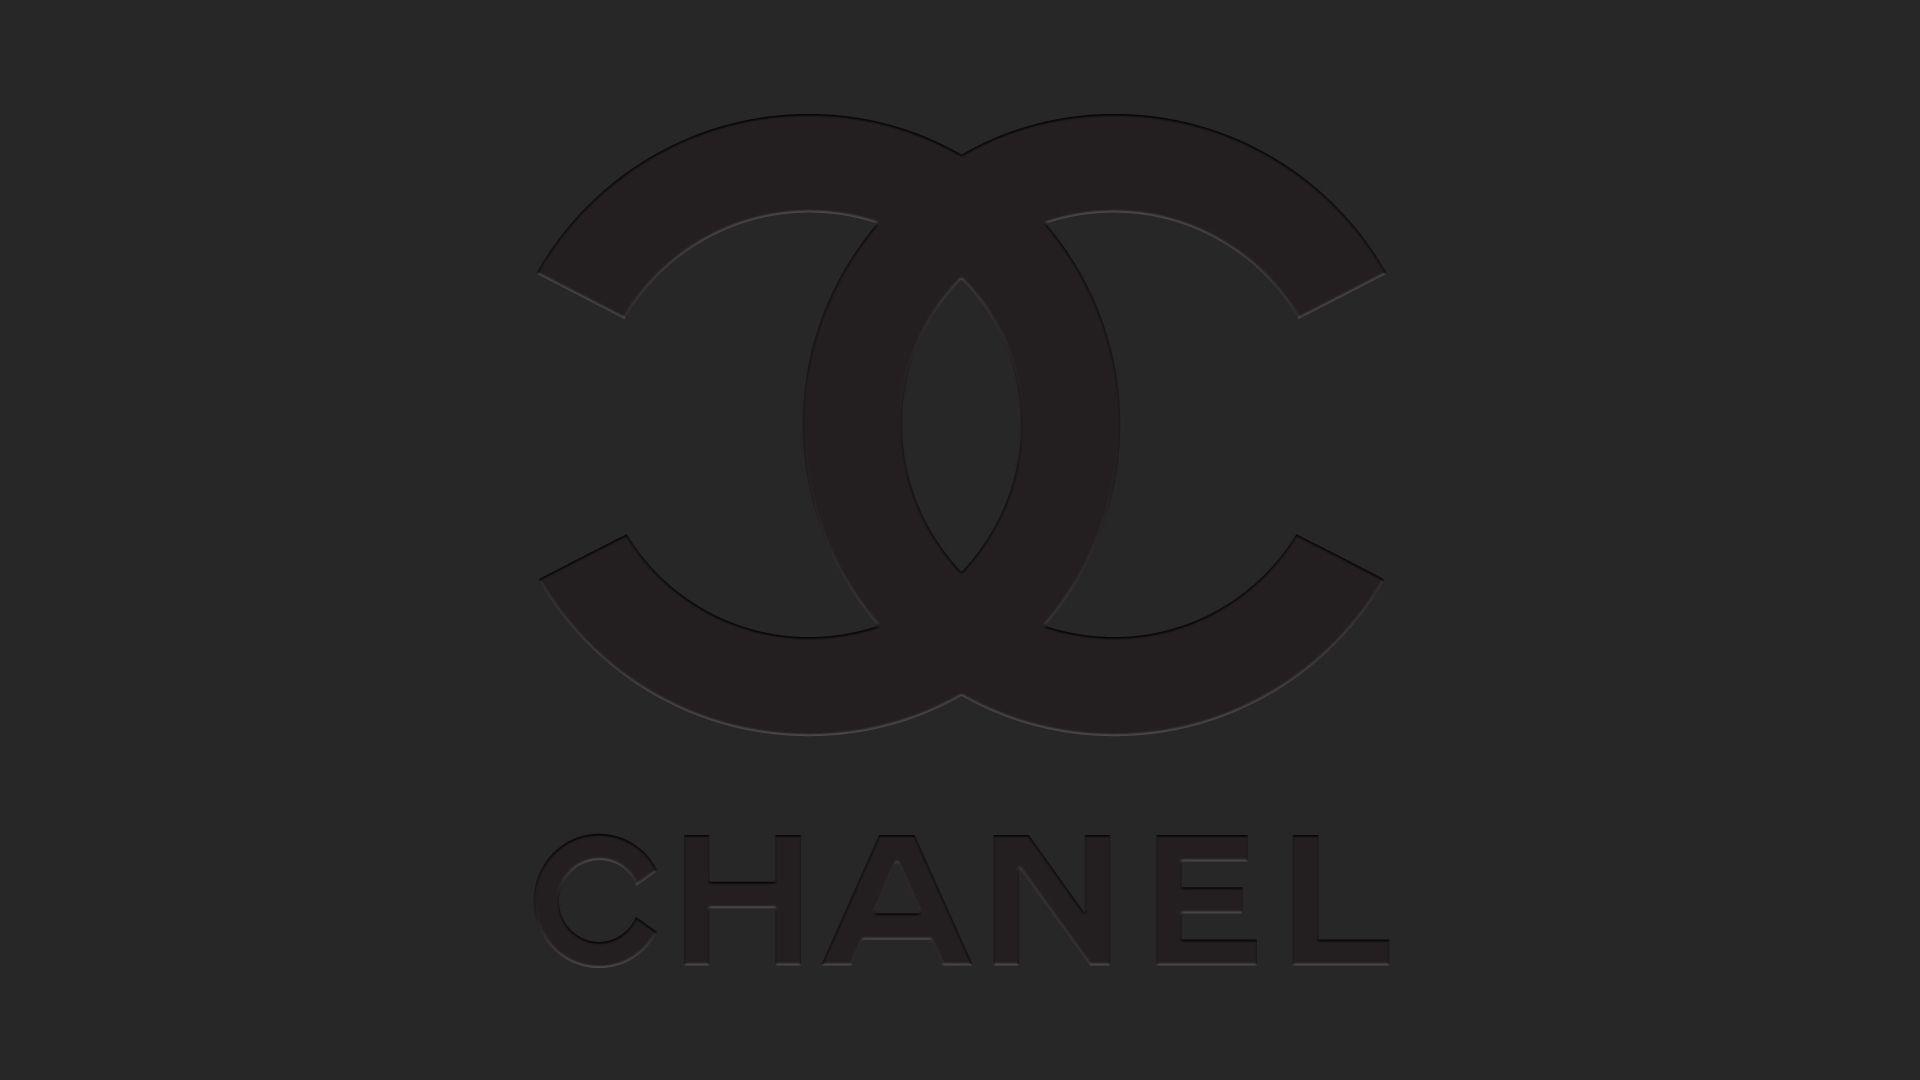 Cute Thanksgiving Wallpapers Free Logo Chanel Wallpapers Hd Pixelstalk Net